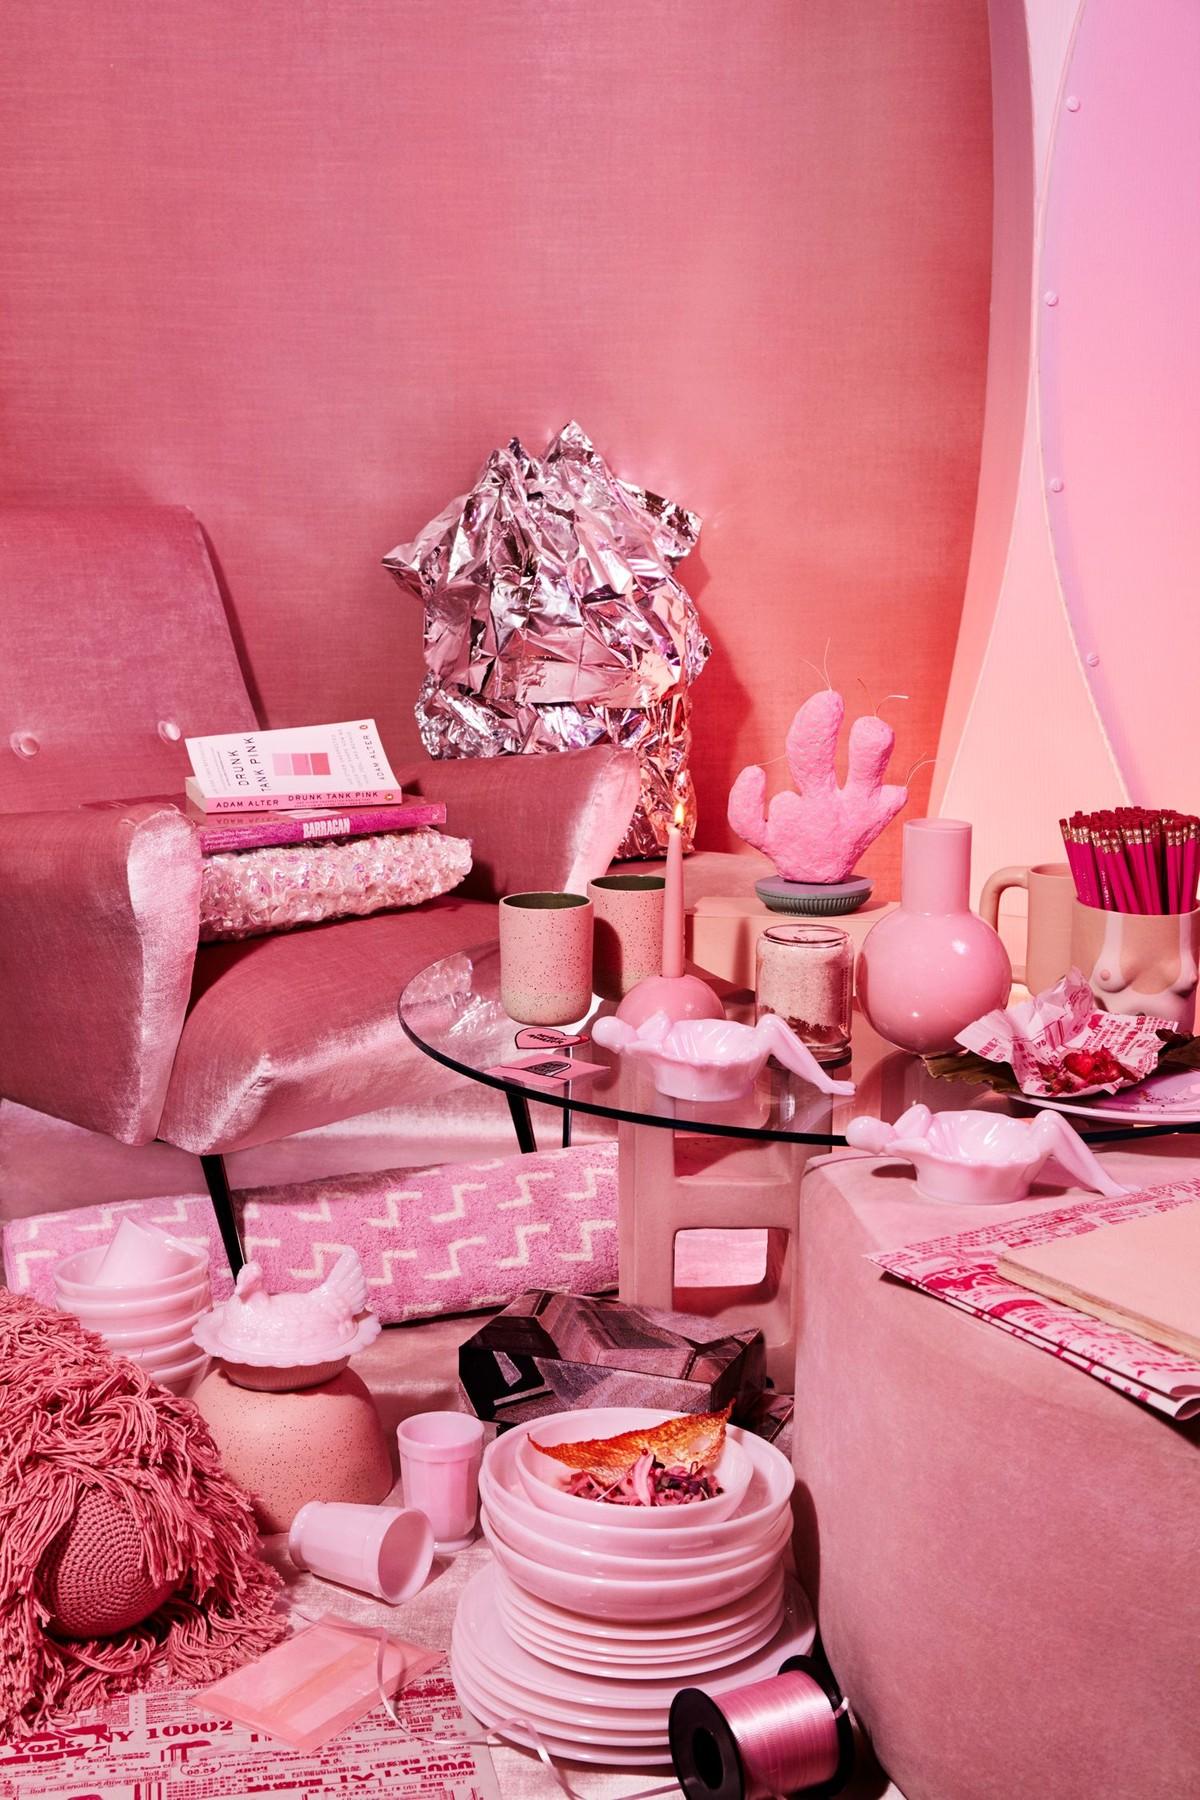 coming-soon-nyc-pink-basement-room-google-search.jpeg